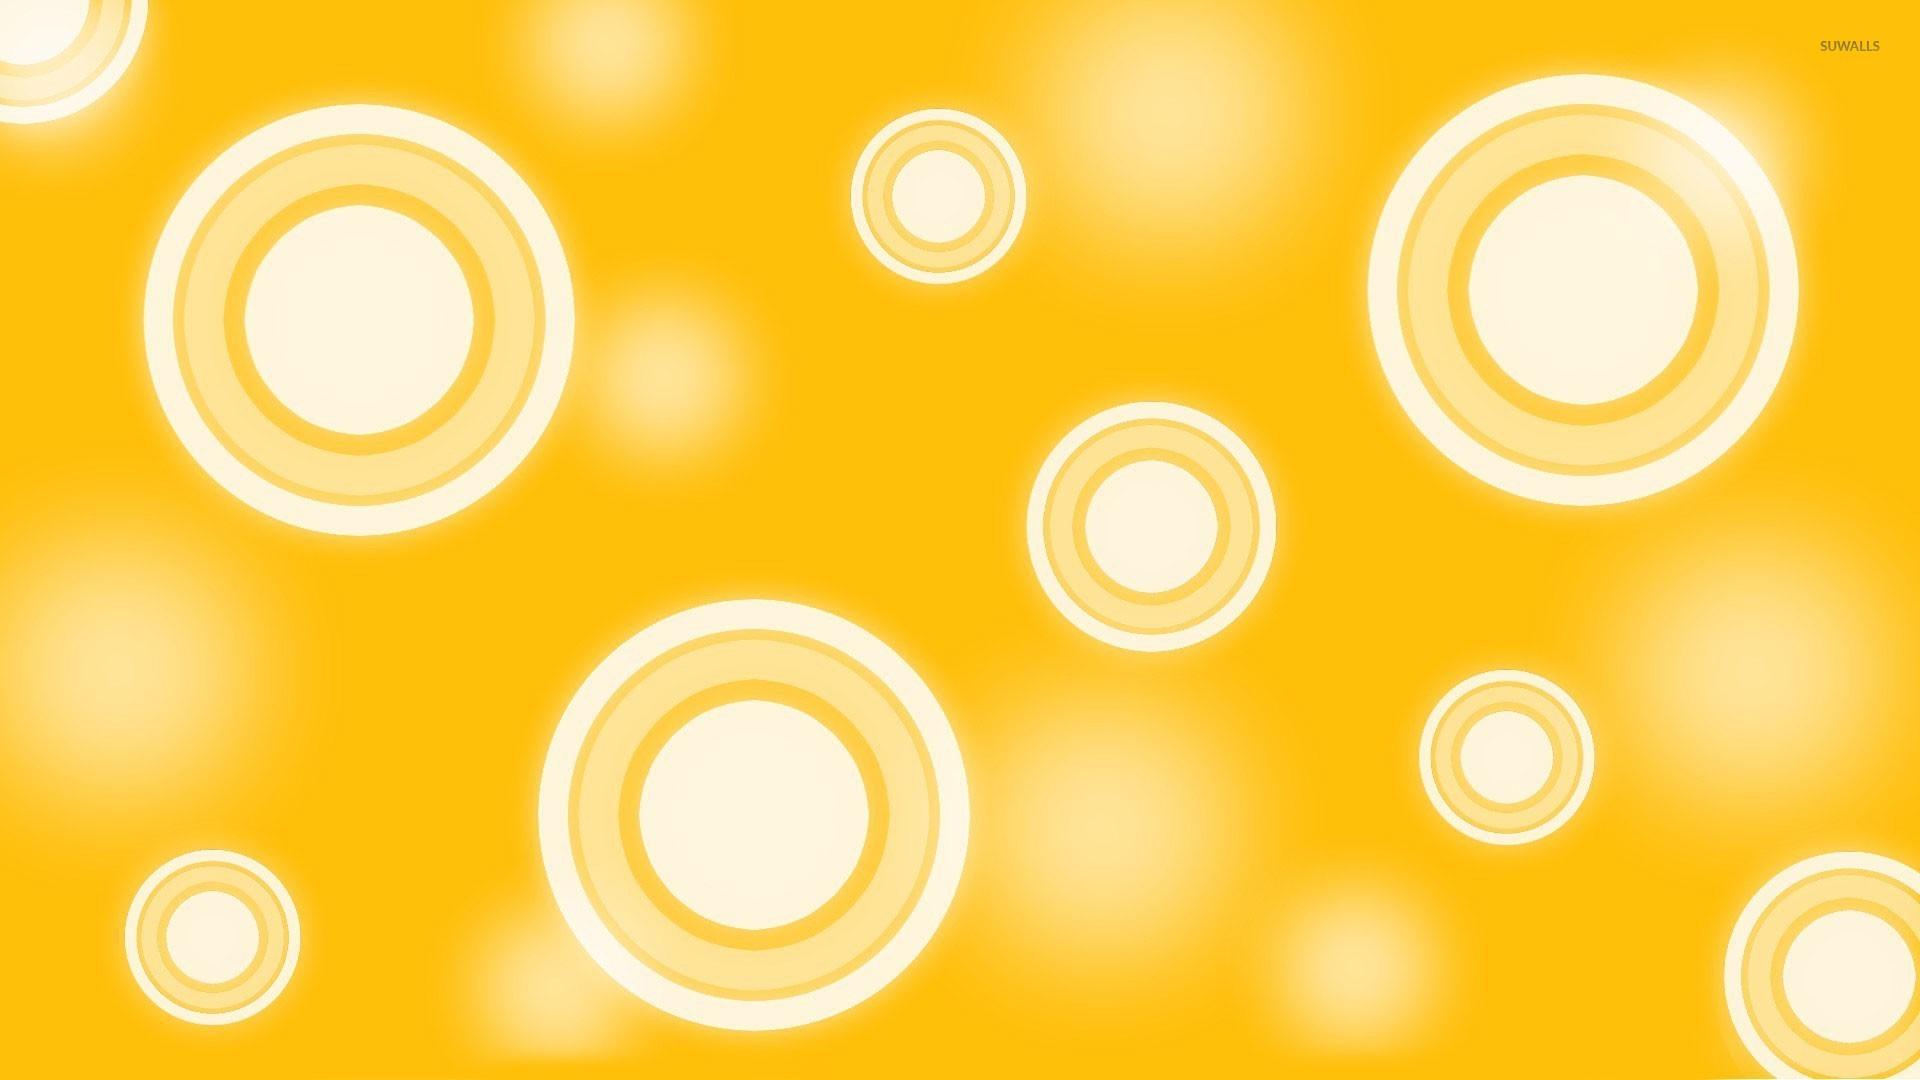 3d Cube Live Wallpaper Download Retro Yellow Circles Wallpaper Abstract Wallpapers 20563